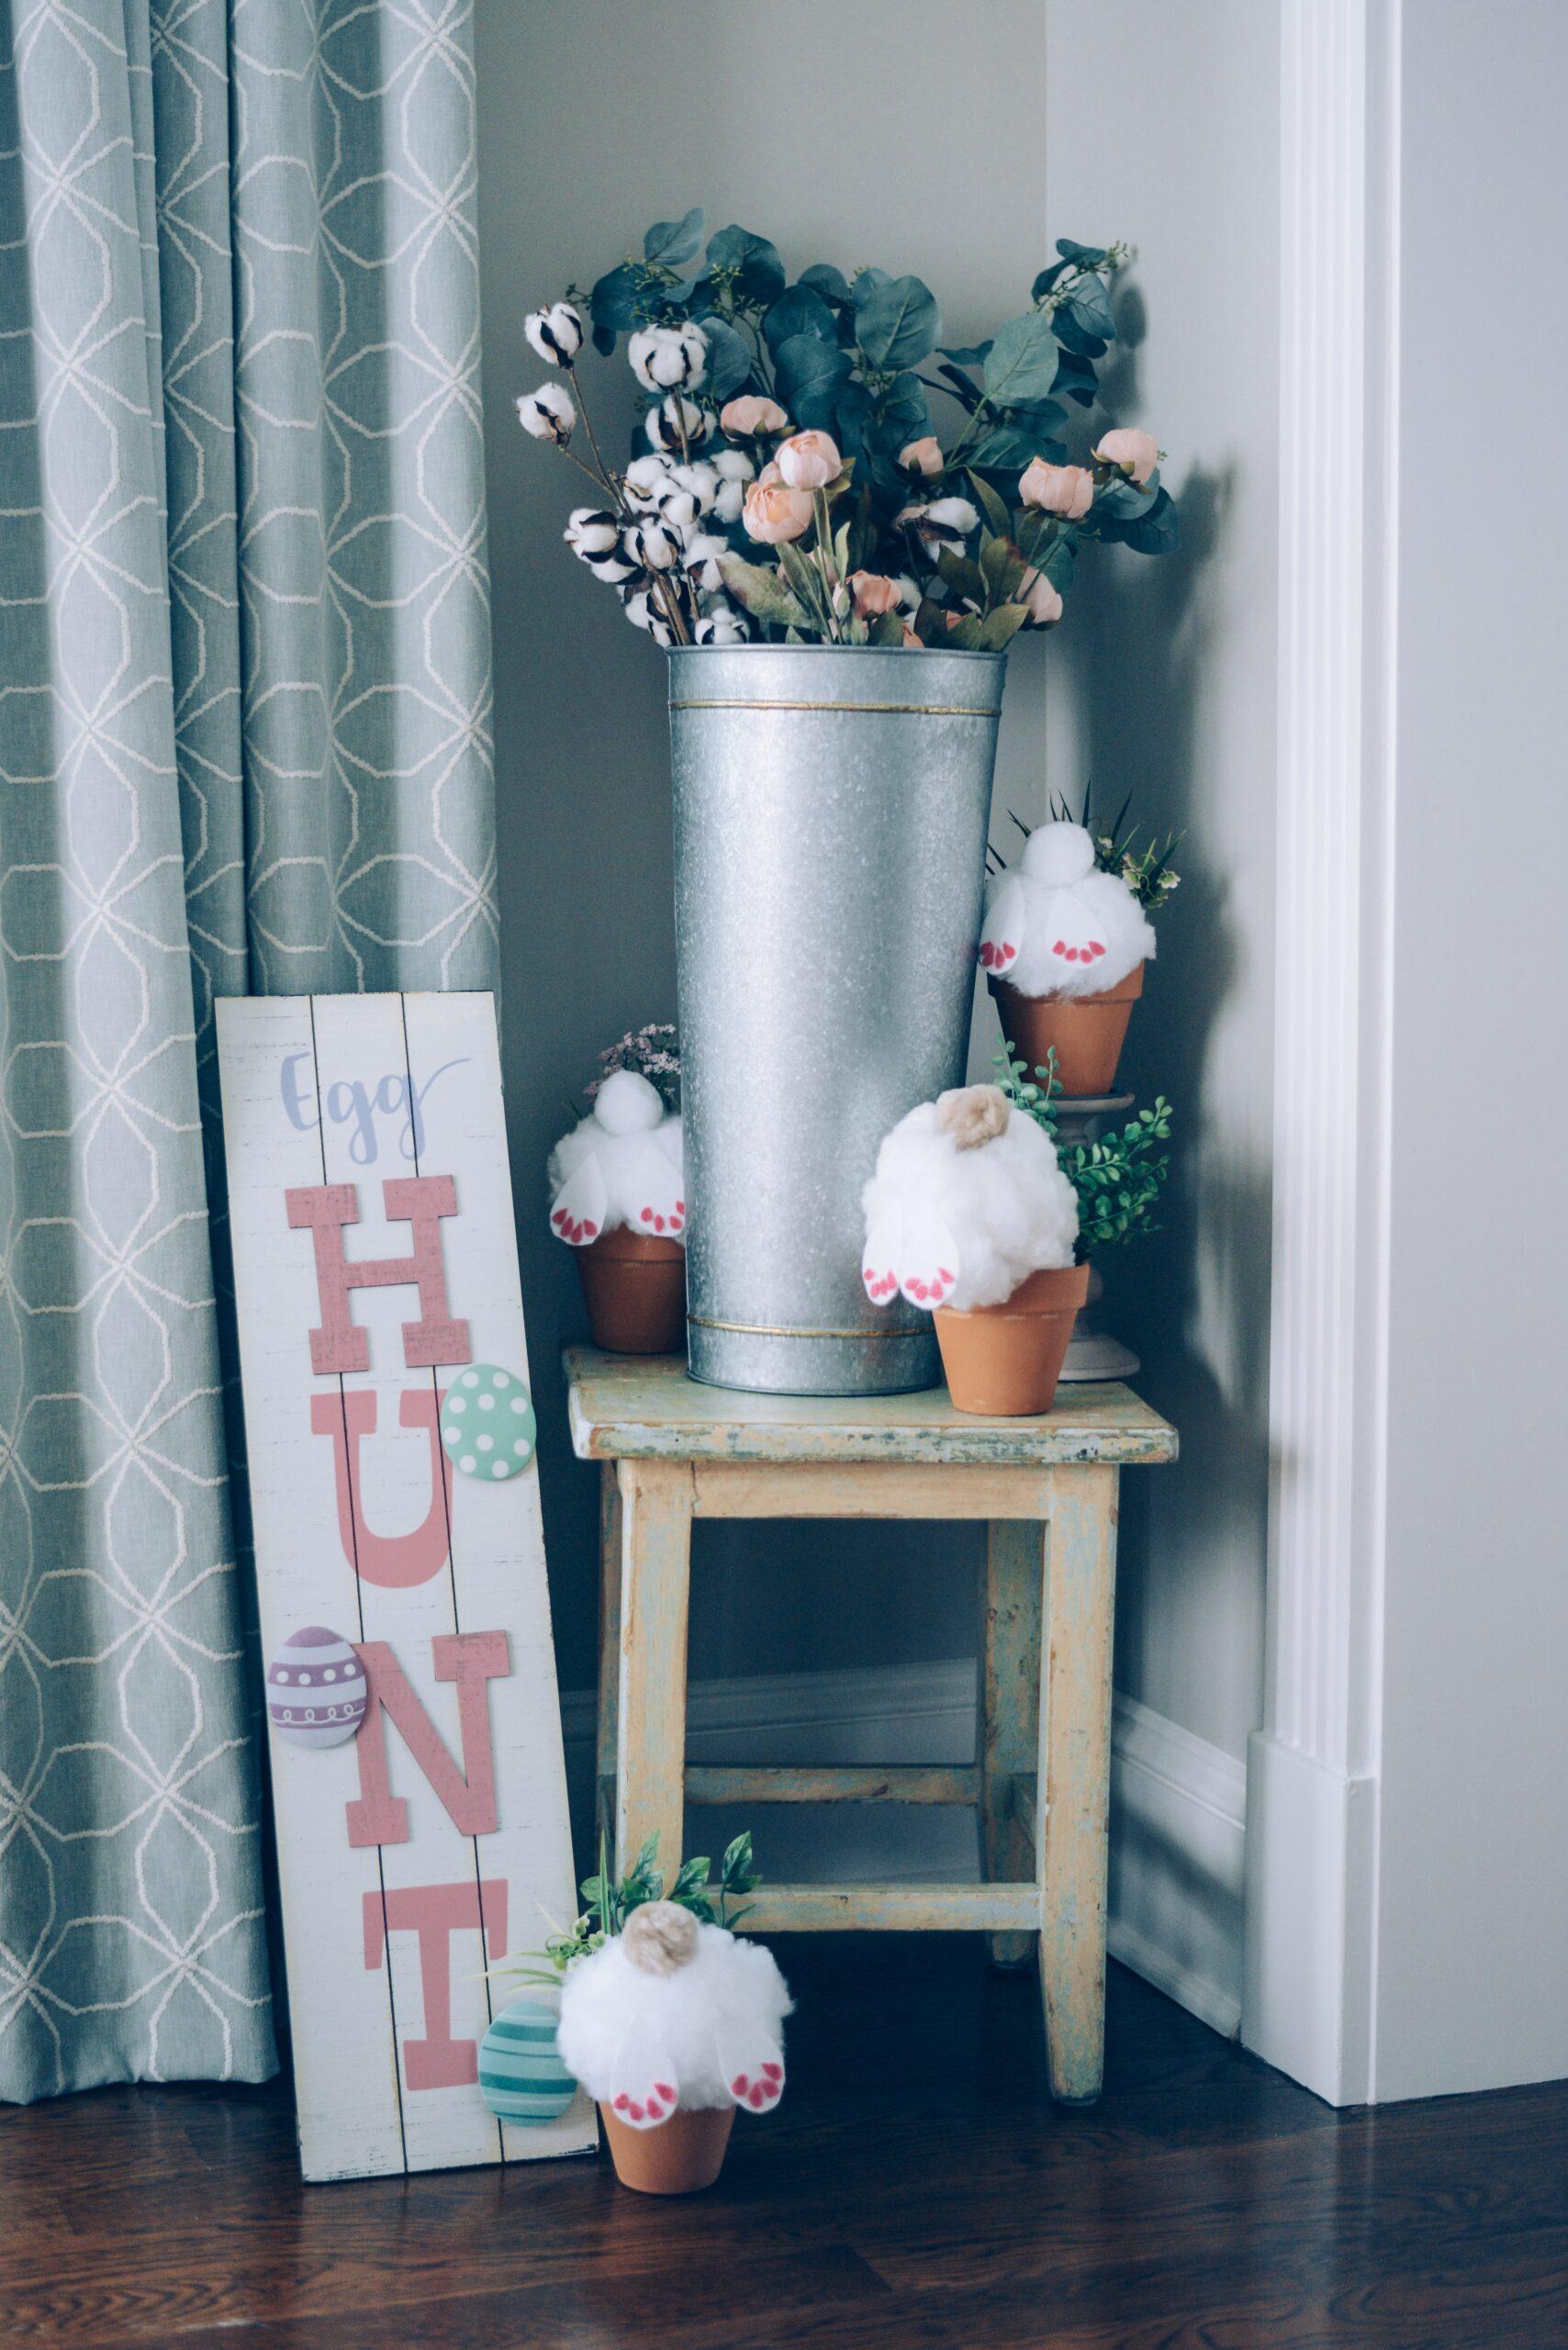 The Cutest Diy Spring Easter Home Decor Idea Instinctively En Vogue